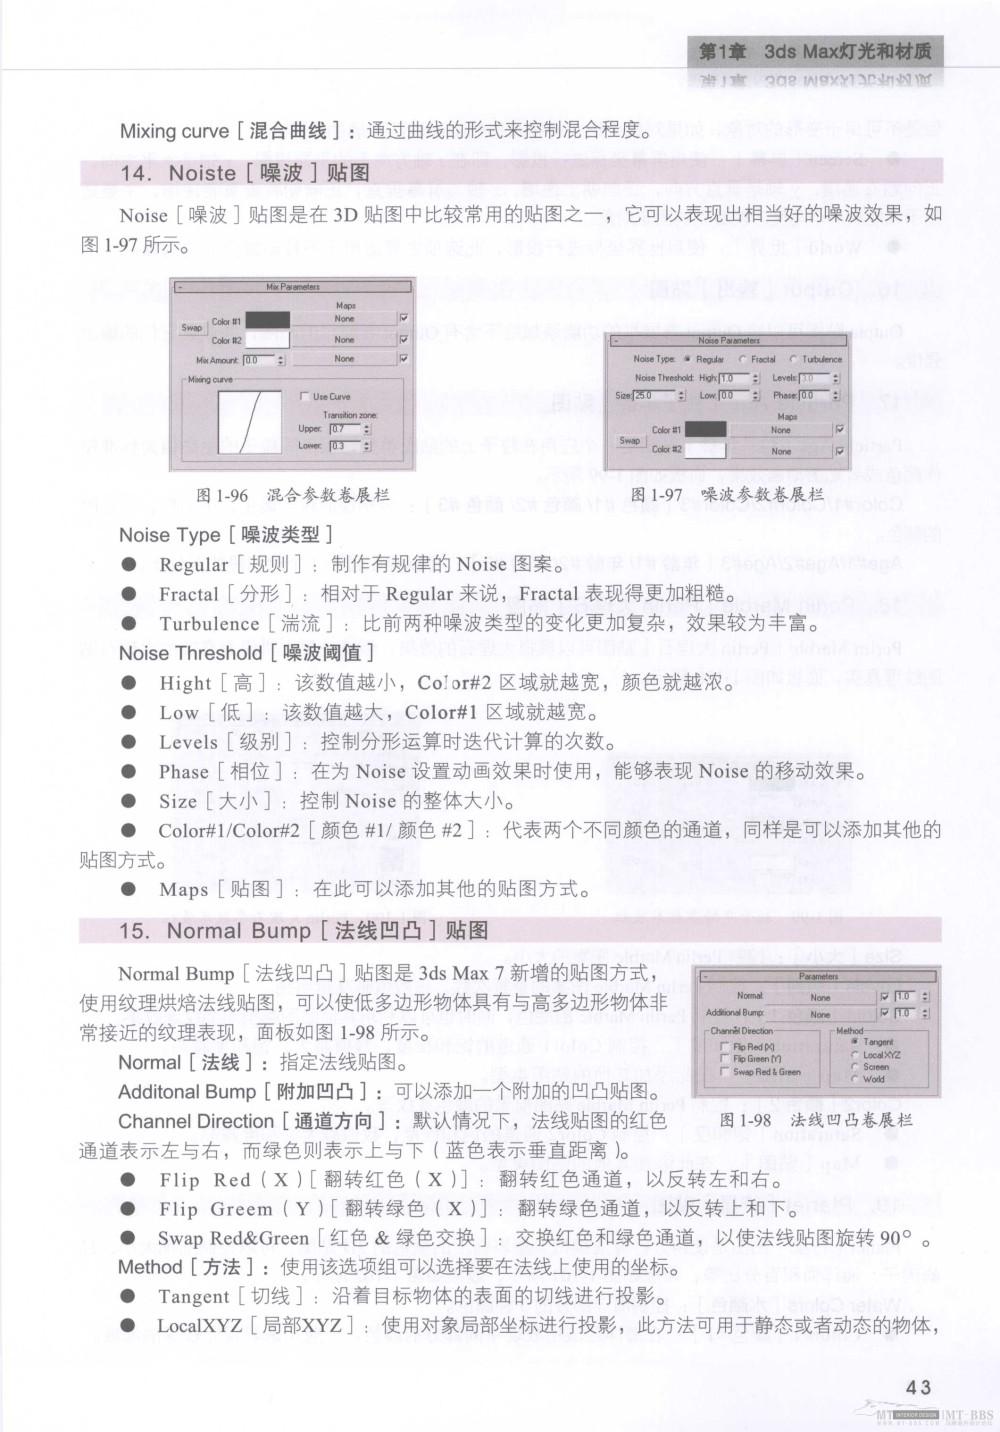 水晶石技法-3ds_Max&VRay室内空间表现_水晶石技法-3ds_Max&VRay室内空间表现_页面_049.jpg